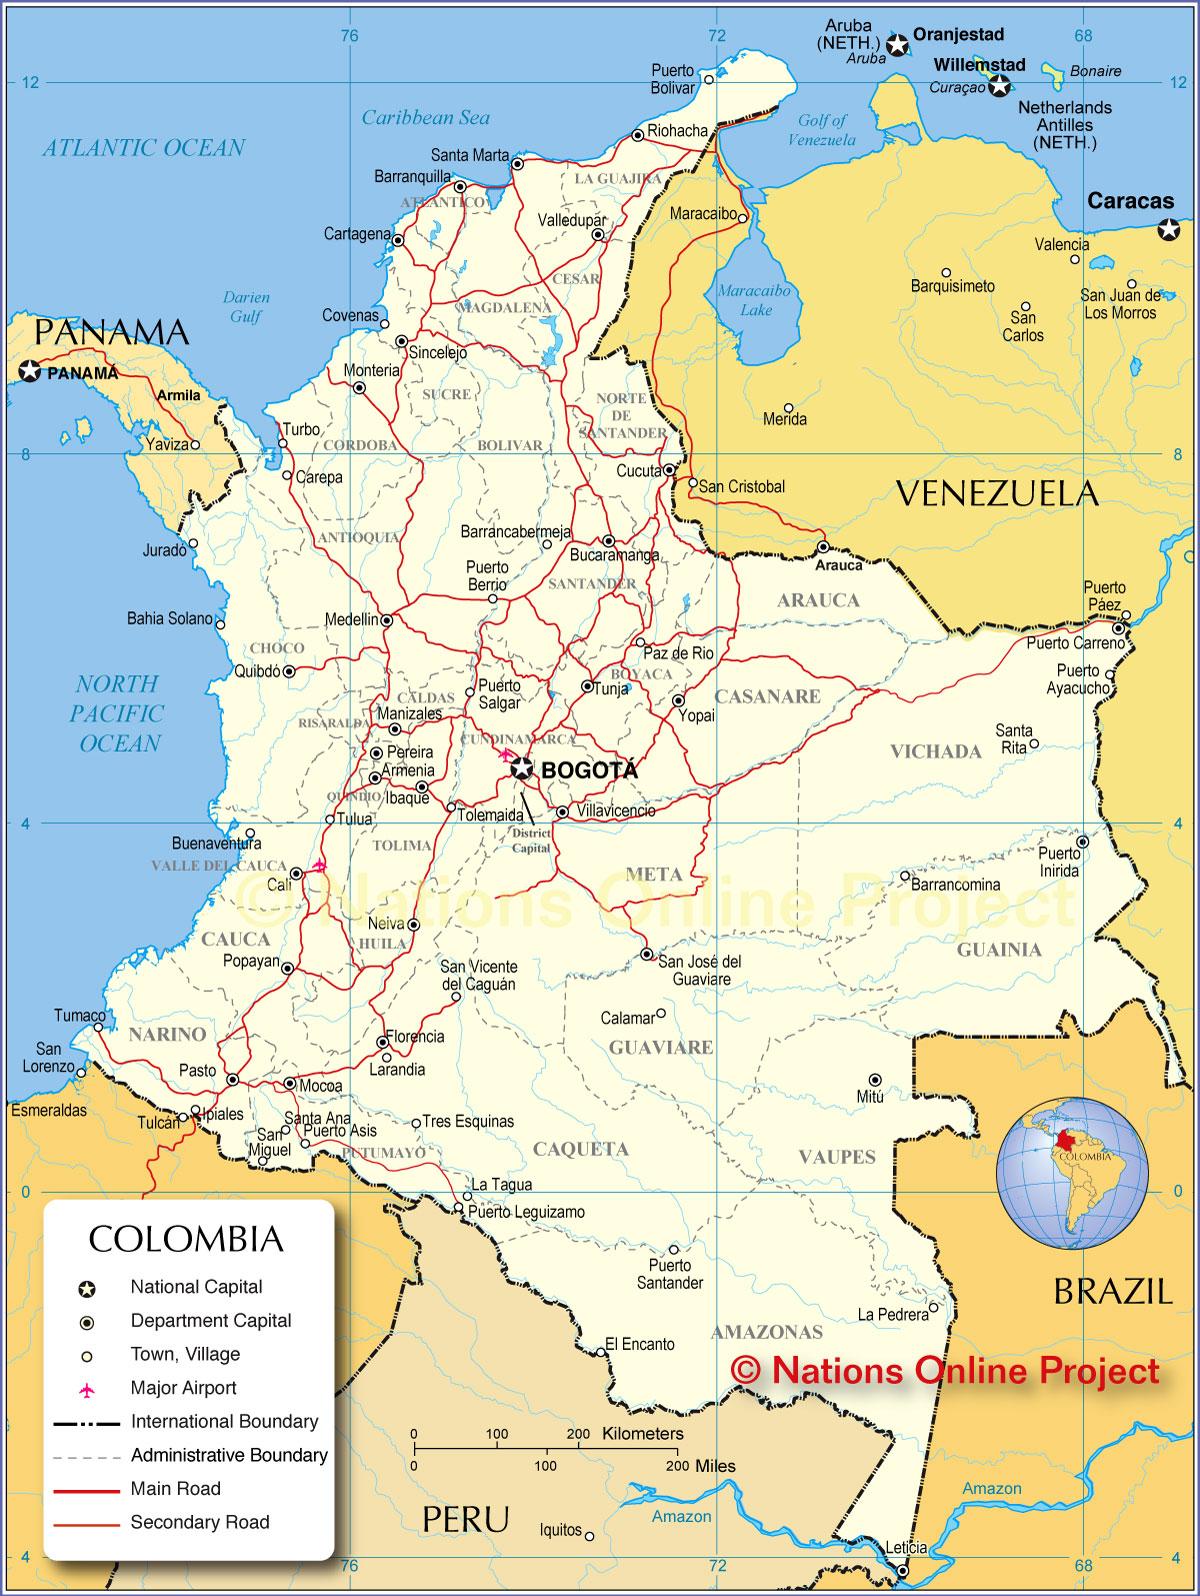 mapa politico de colombia 20171